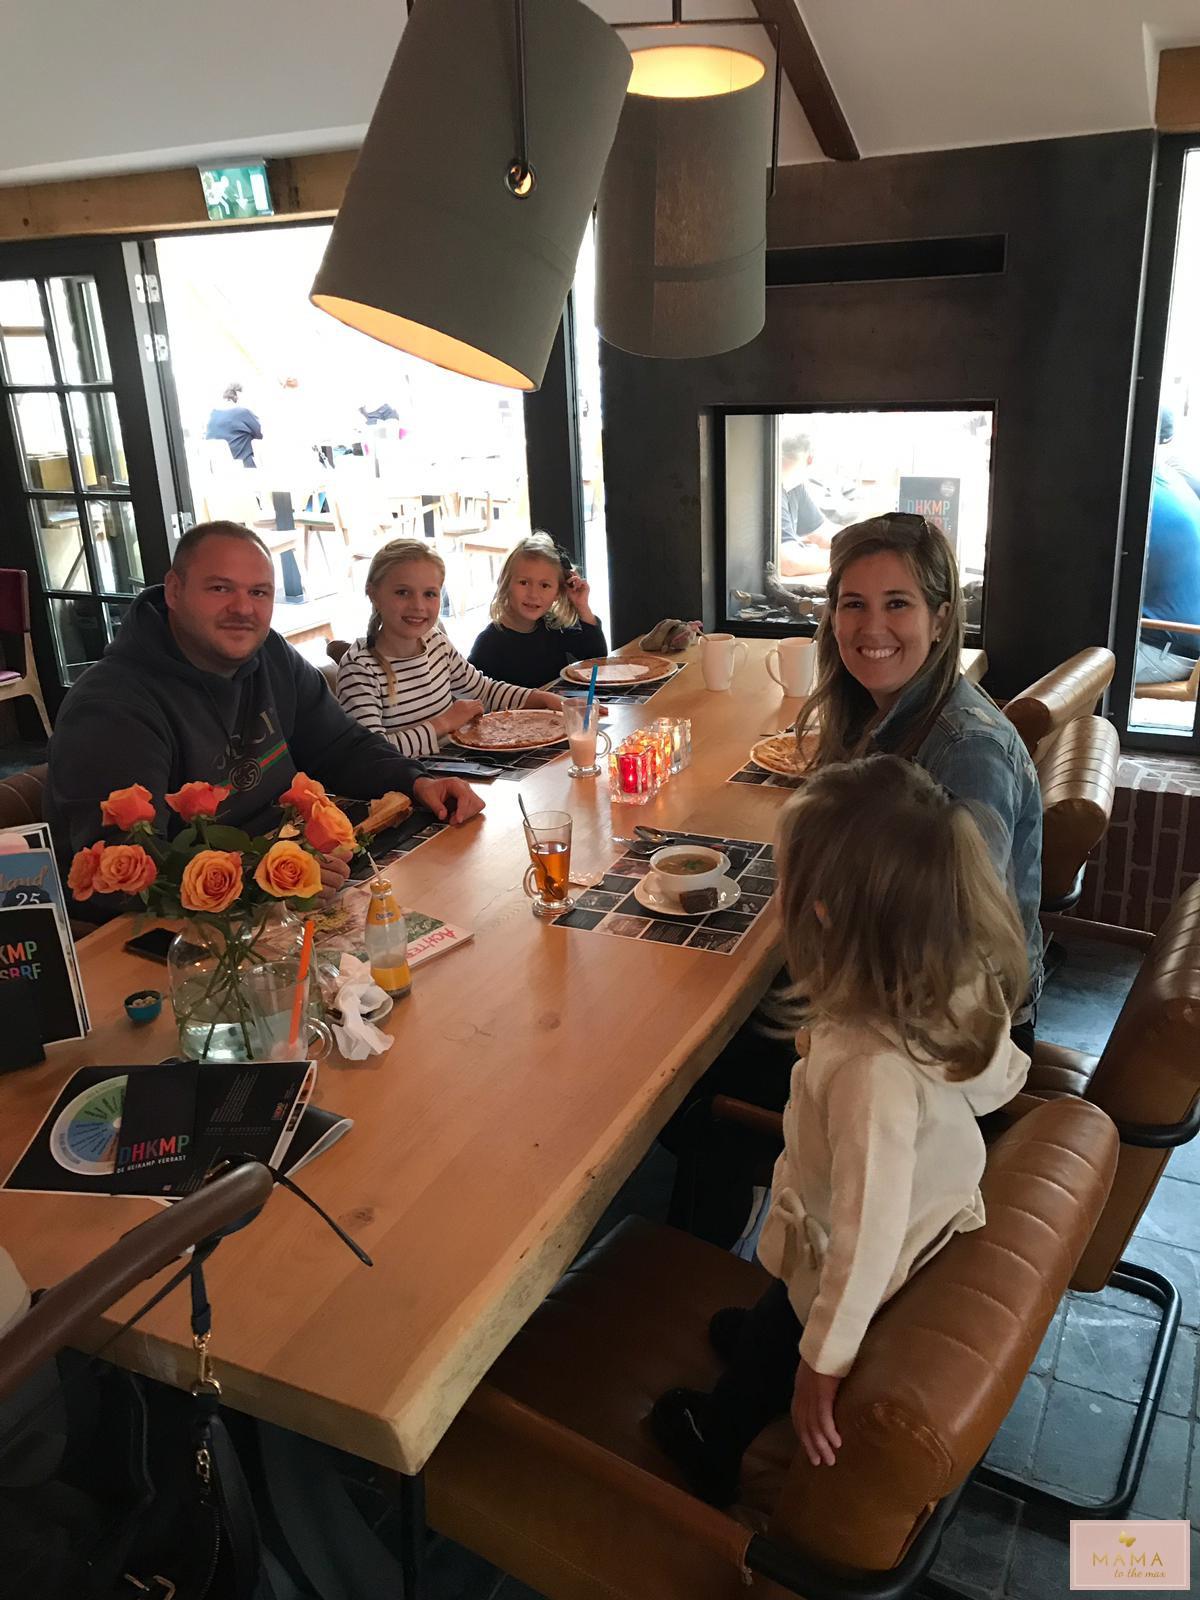 DE HEIKAMP lunchen, blogtrip 3, veluwe